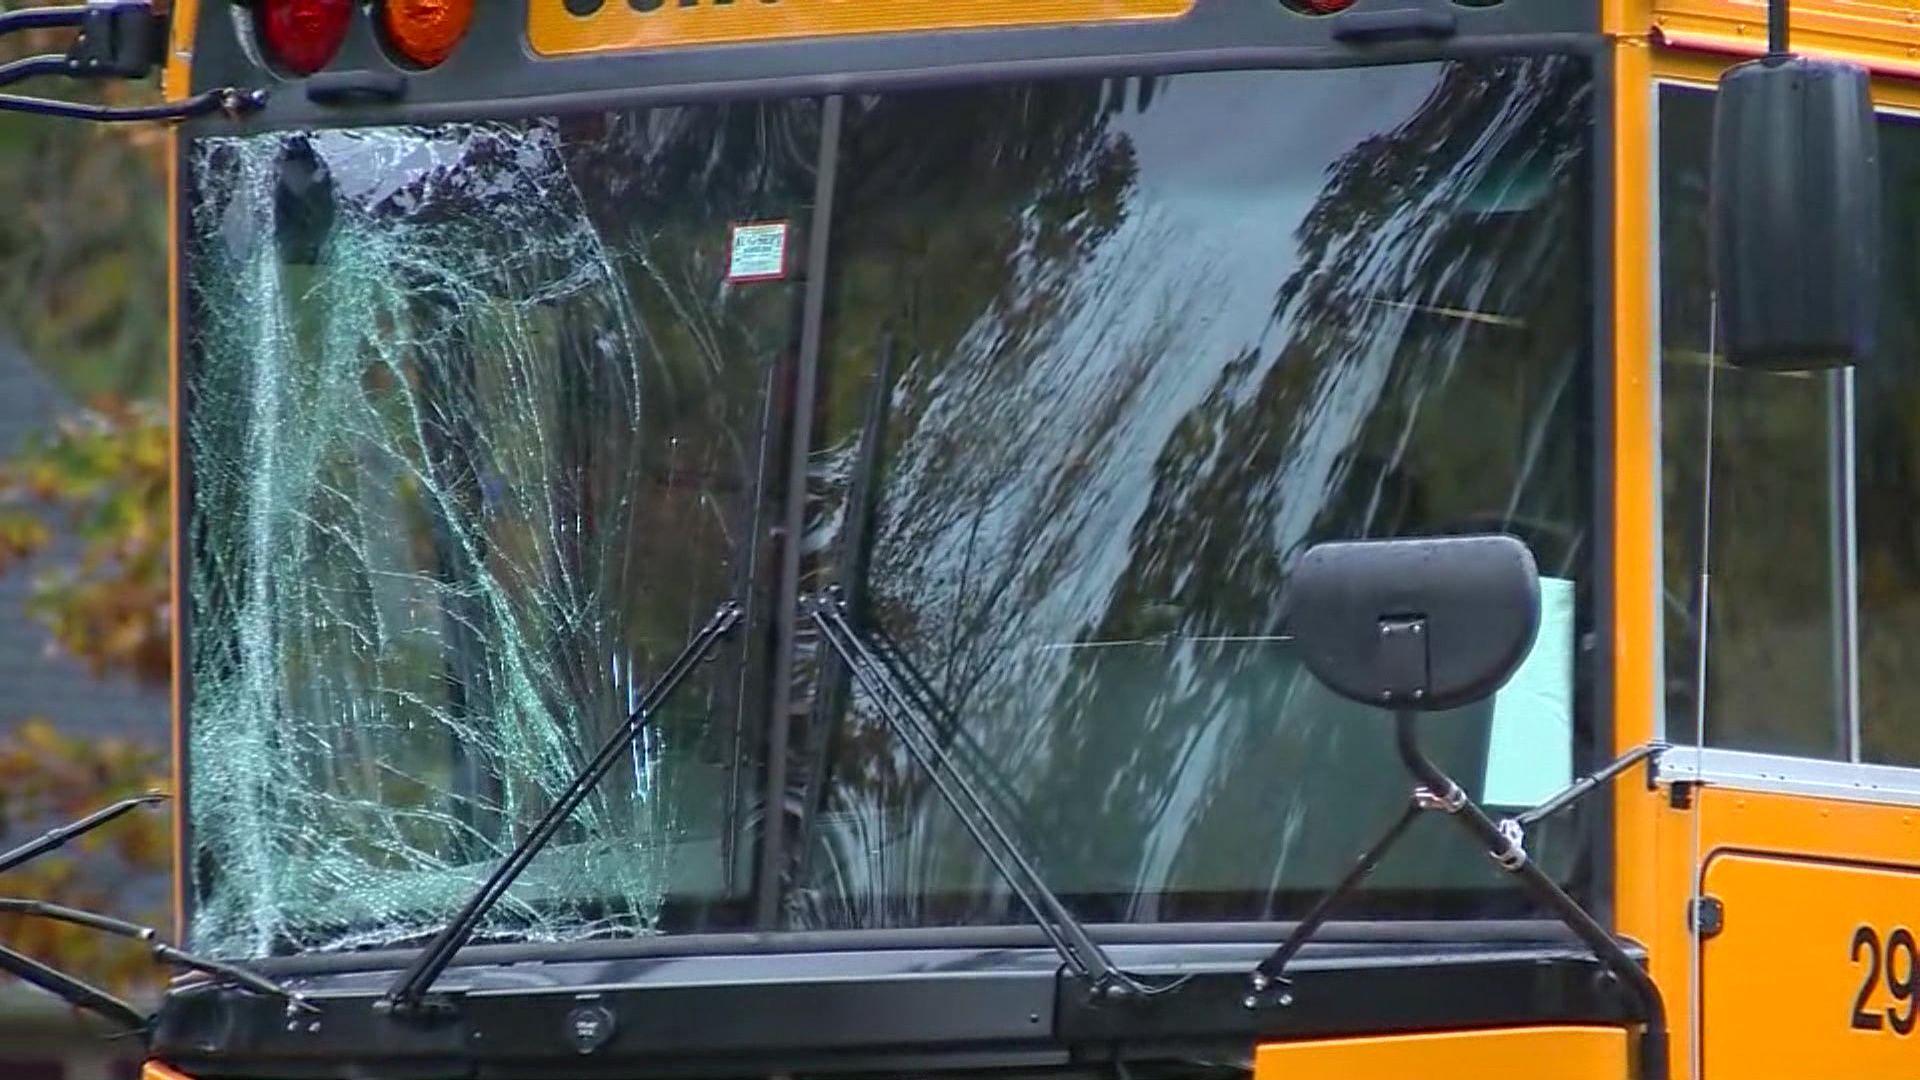 Chelmsford Bus Crash 002 1508966192 Jpg